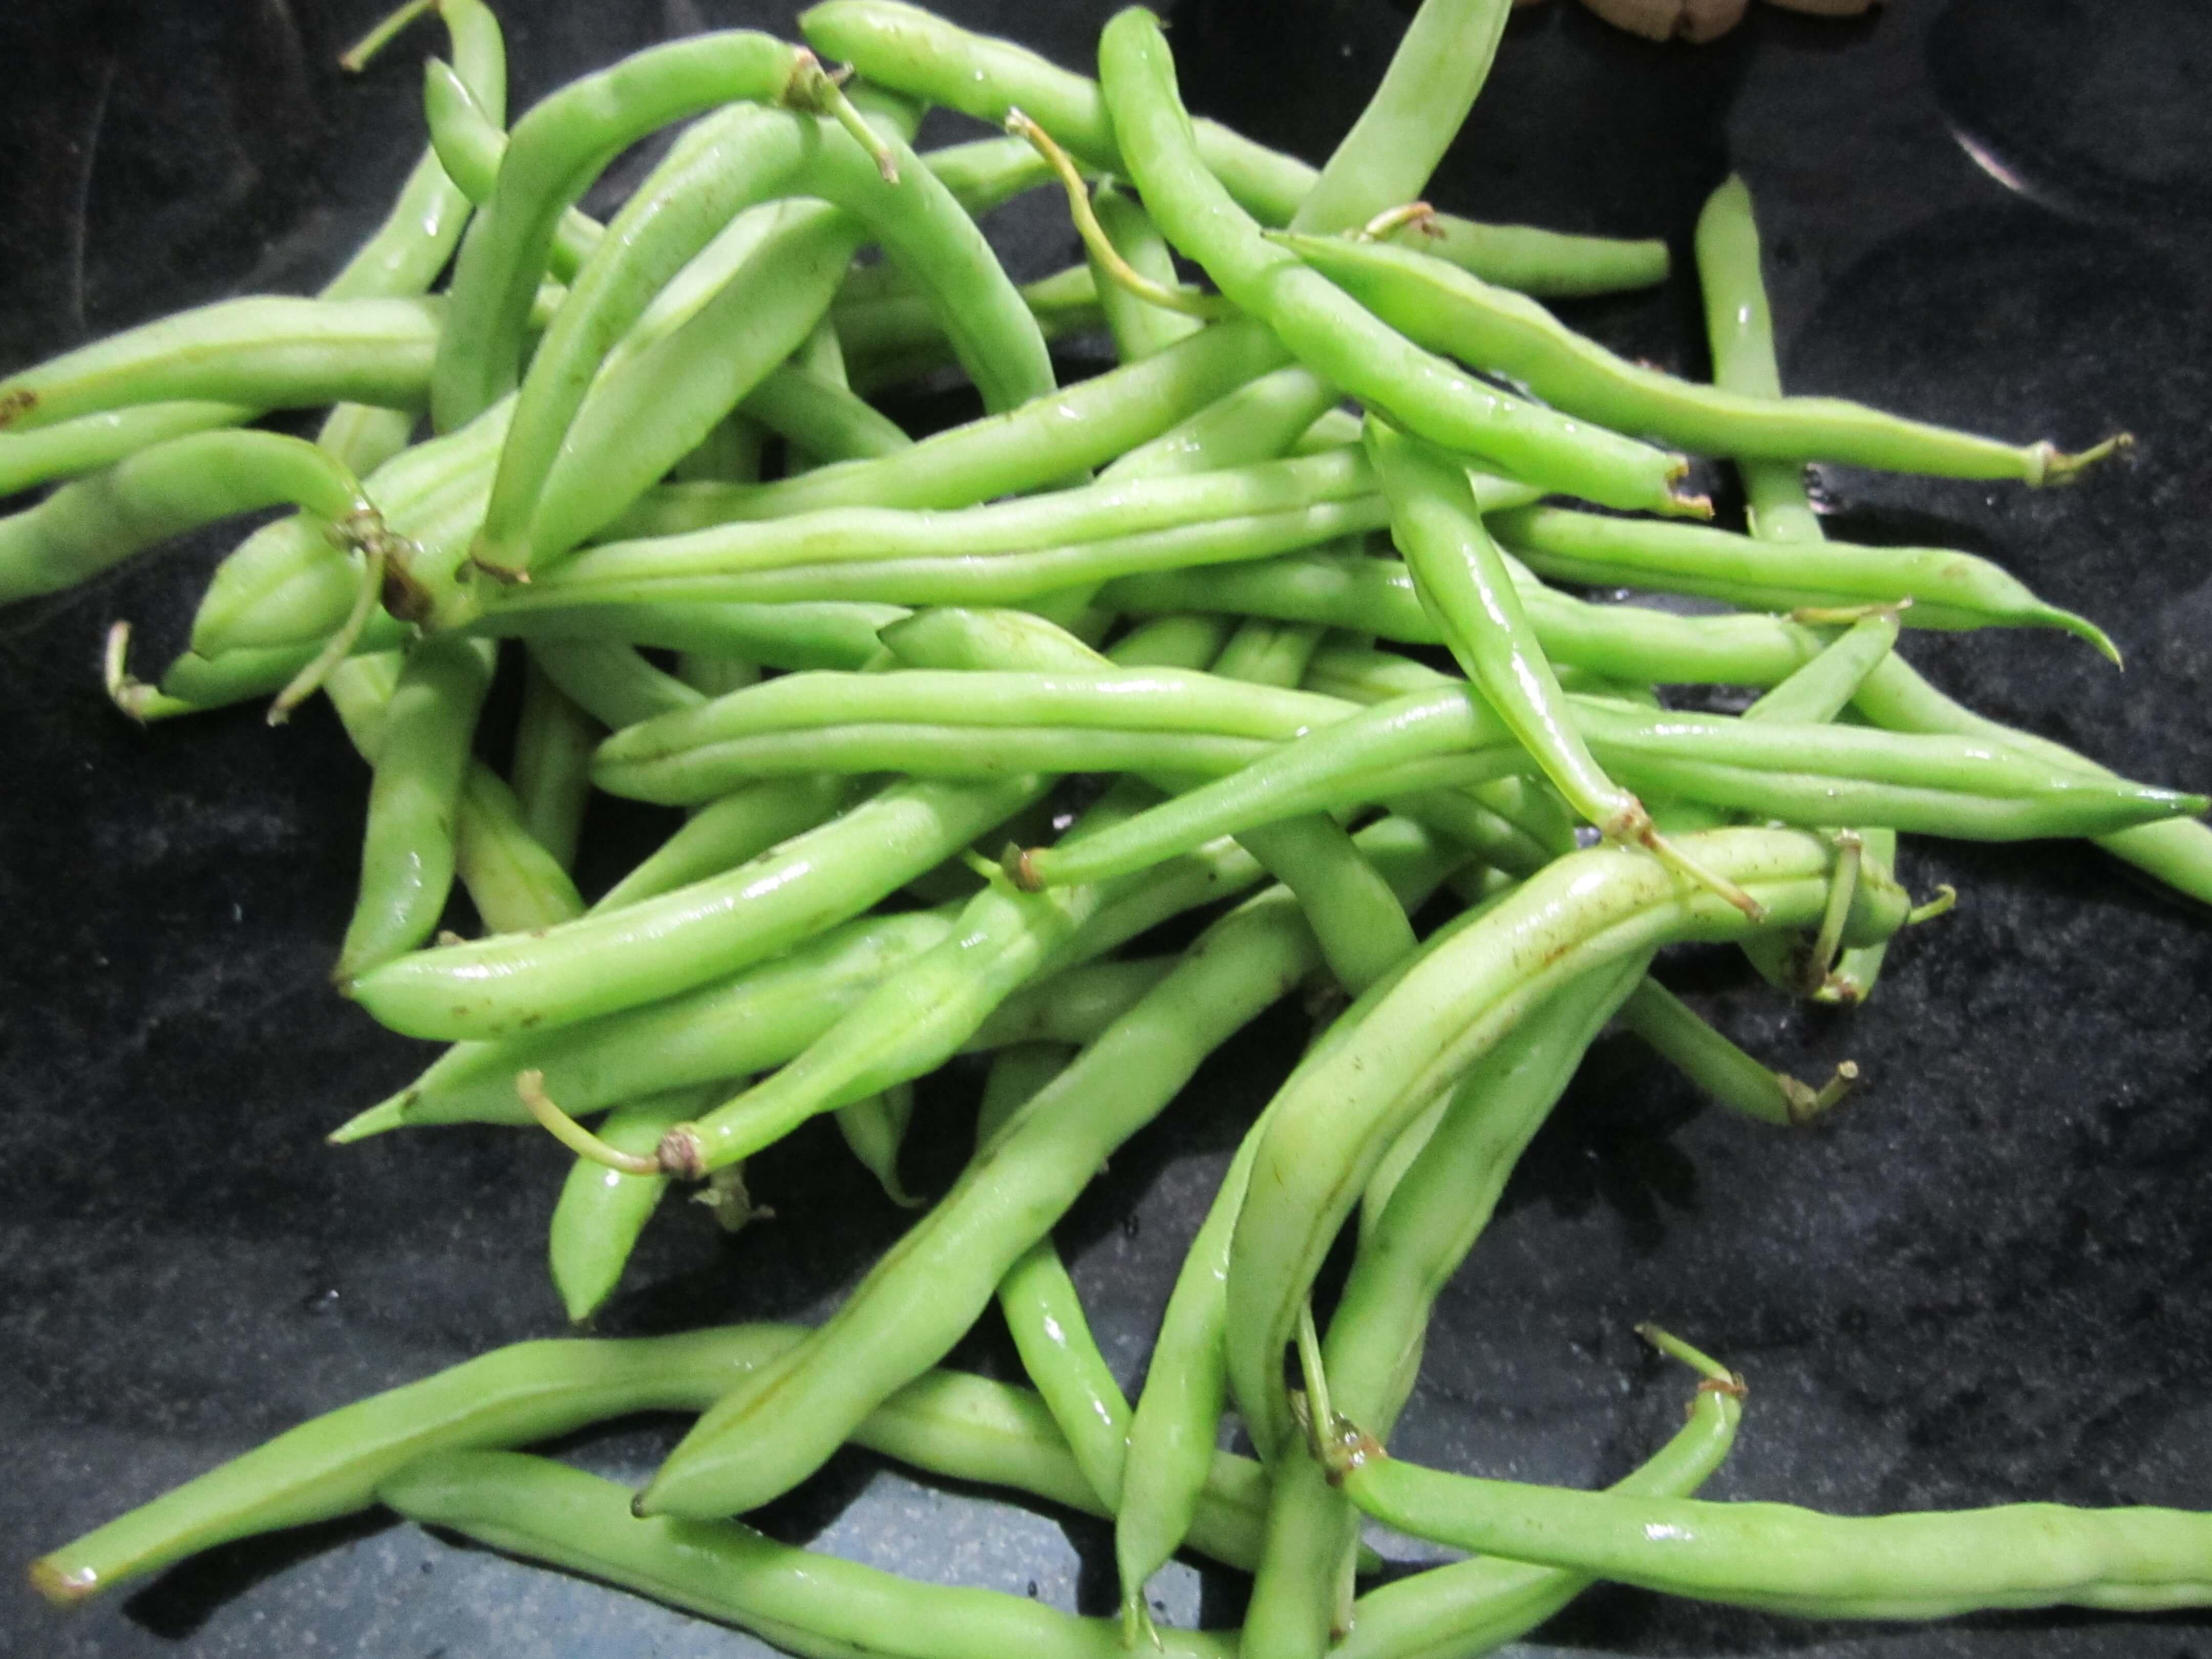 Bean Provider Green Bush Urban Seedling